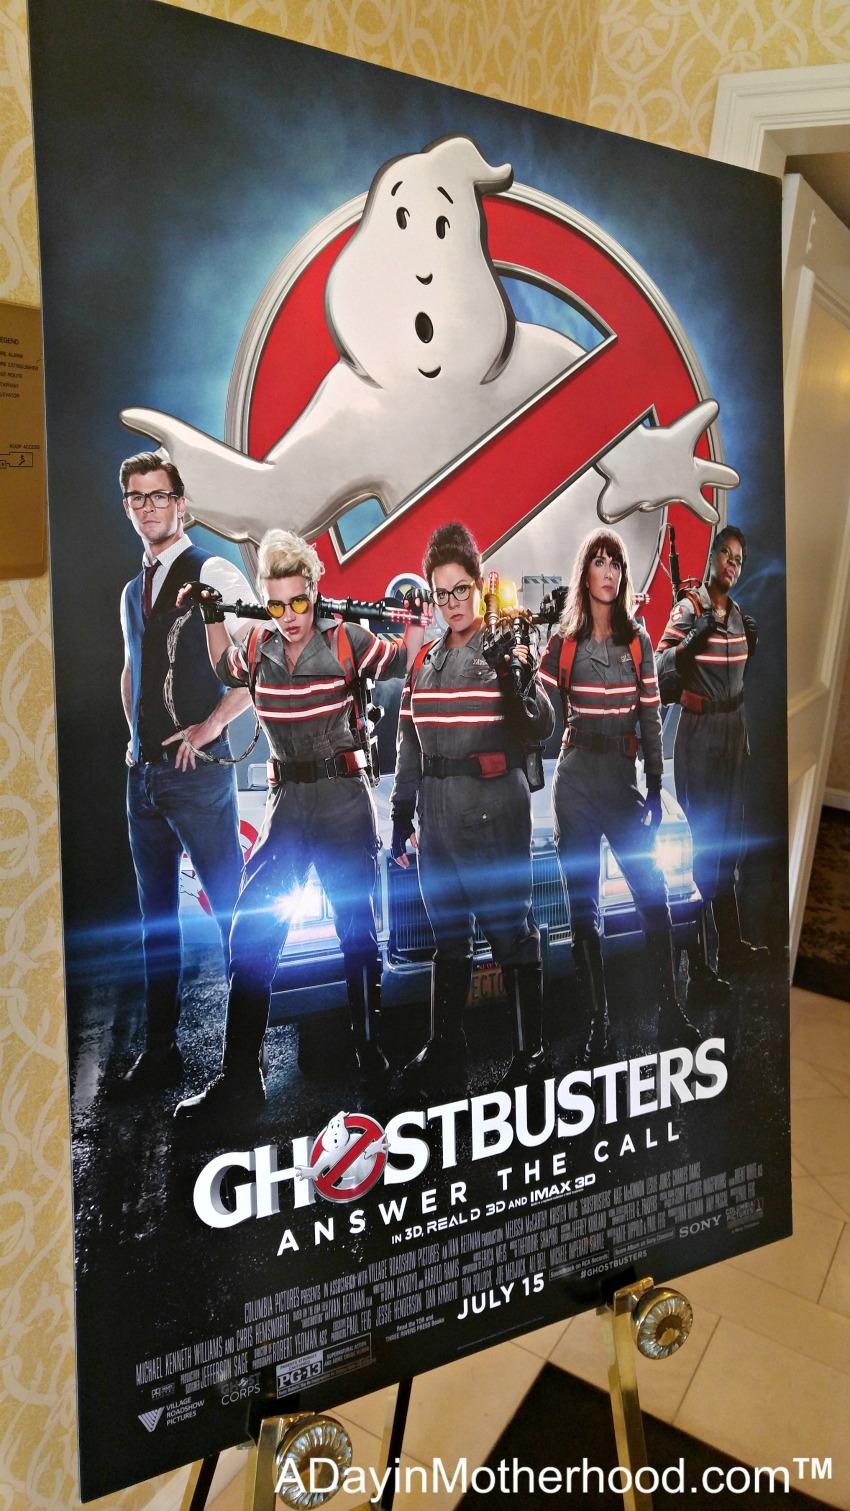 Ghostbuster Movie Press Junket #Ghostbusters #Ghostbloggers #ad